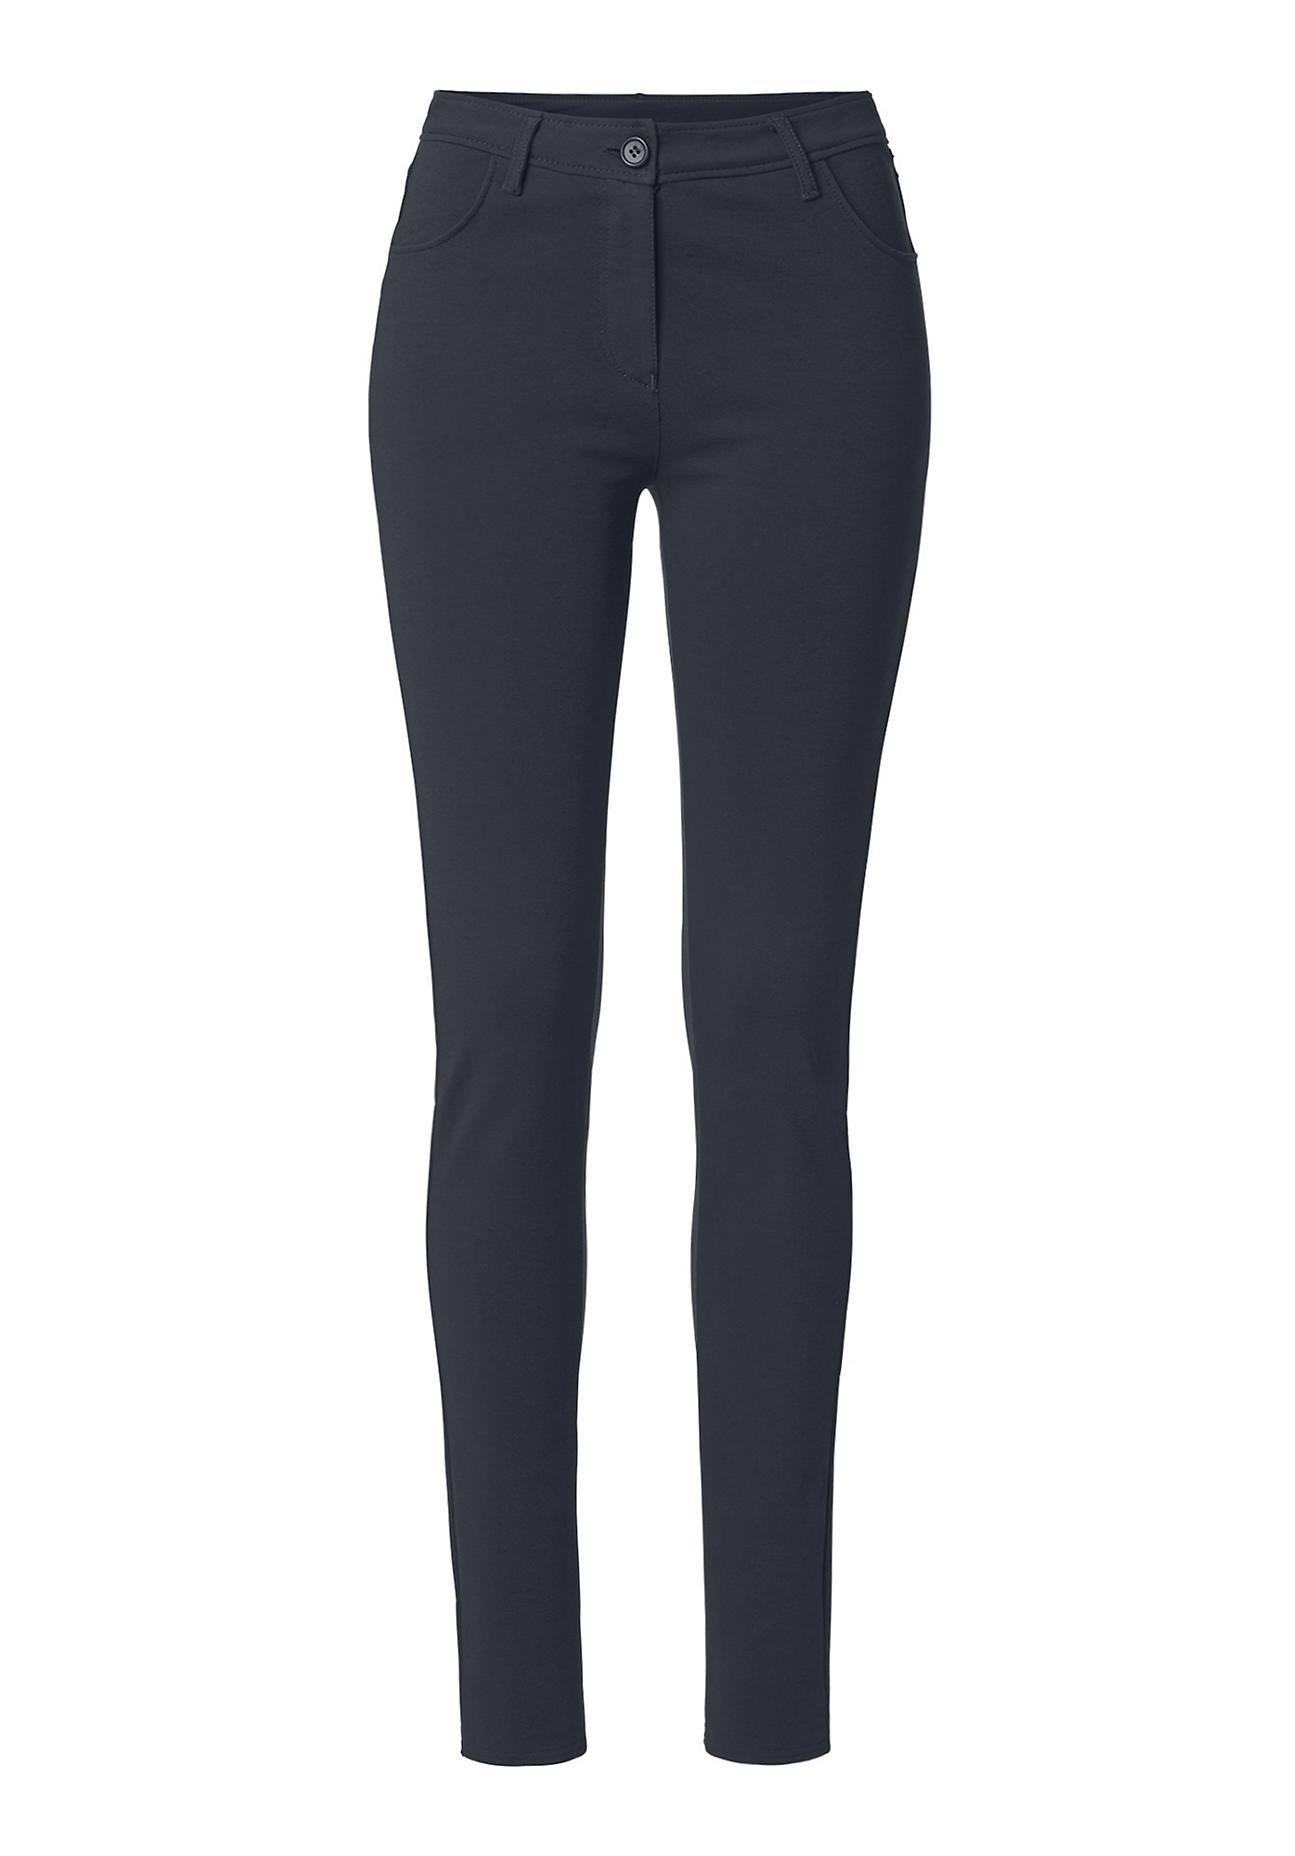 hessnatur damen stretch hose aus bio baumwolle schwarz gr e 38 damen jeans hosen. Black Bedroom Furniture Sets. Home Design Ideas